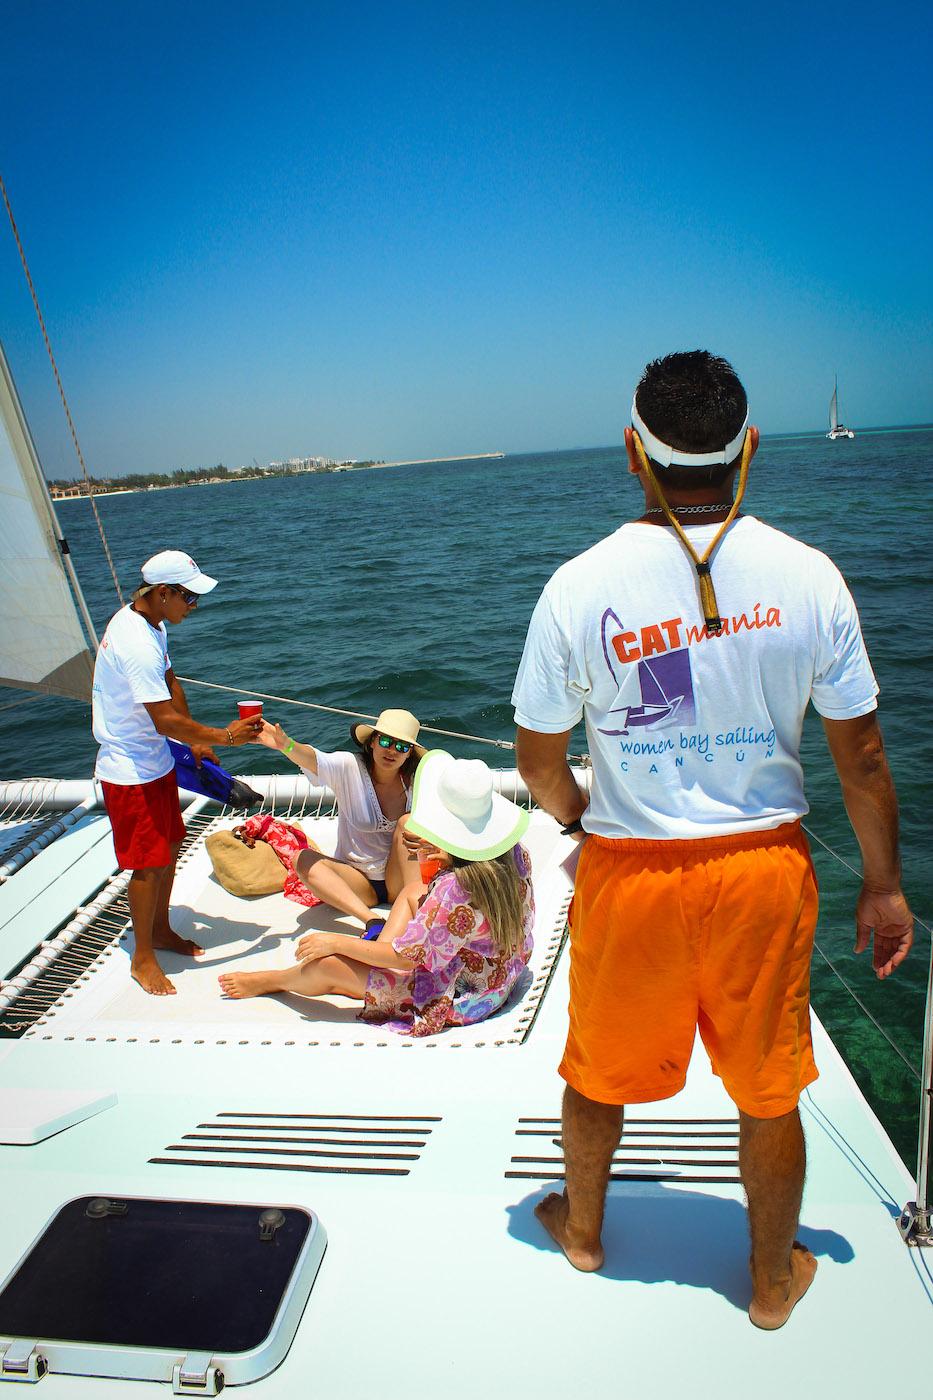 catmania-catamaran-charter-sailing-cancun-isla-mujeres